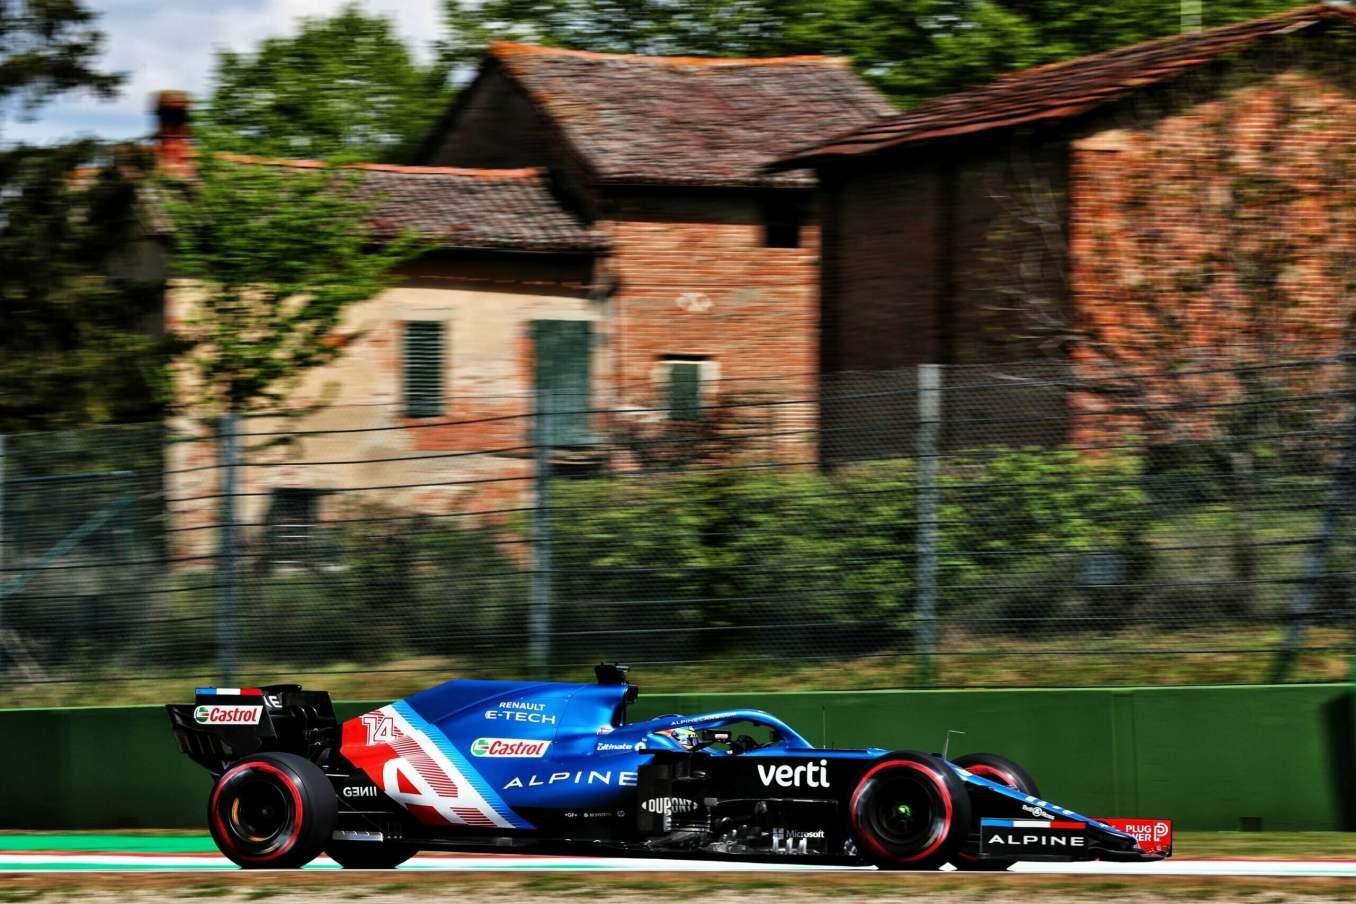 Alpine F1 Team A521 Alonso Ocon Brivio Permane Imola 2021 Test 28 scaled | Alpine F1 Team en milieu de peloton aux essais à Imola